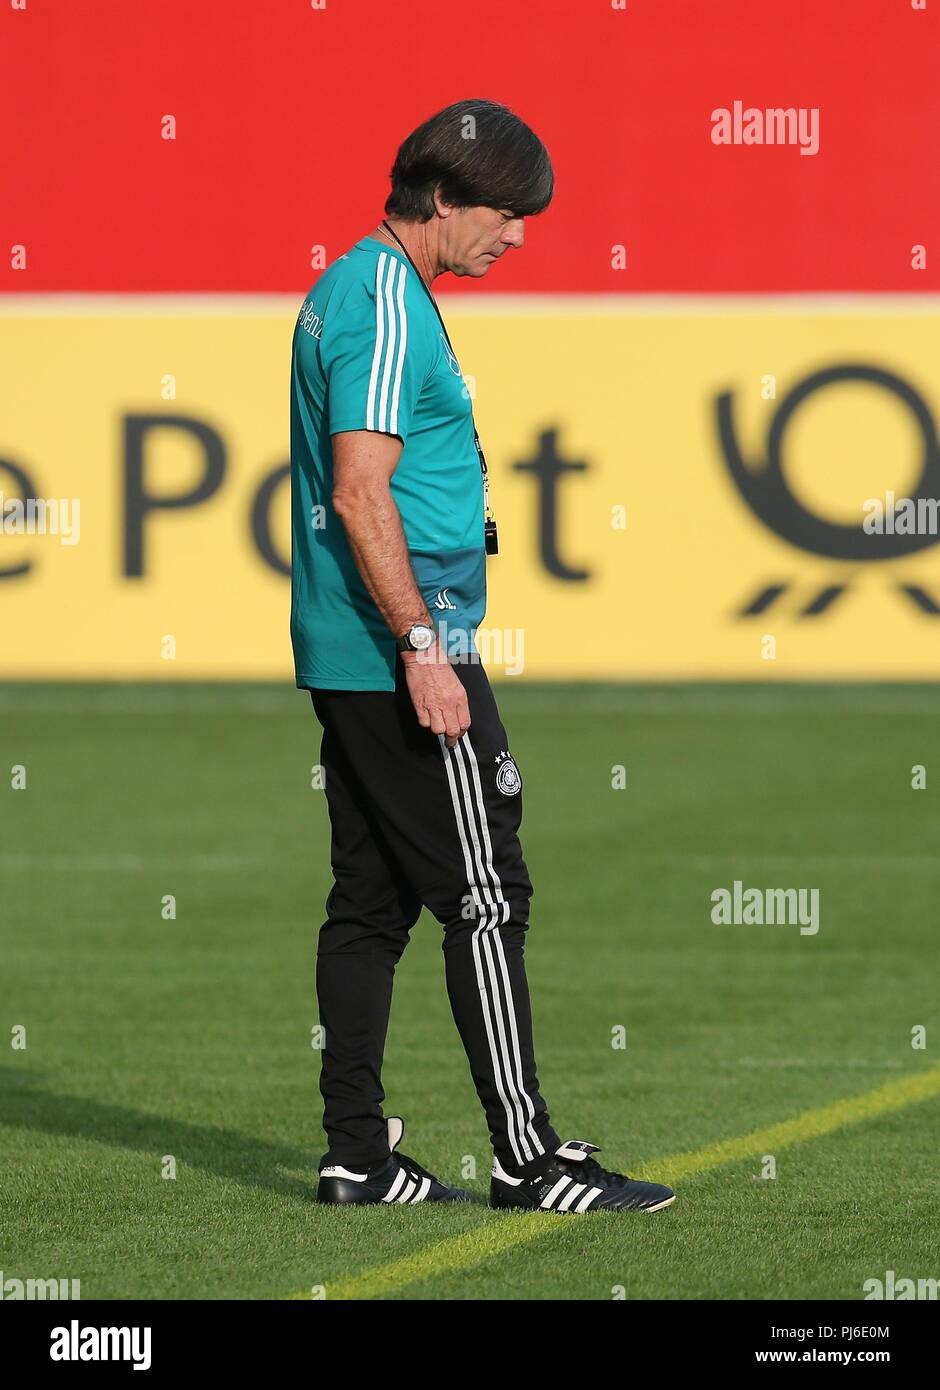 firo: 04.09.2018, football, national team, training, national coach Joachim Lv? w, Loew, DFB, full figure, single action, Germany   usage worldwide - Stock Image